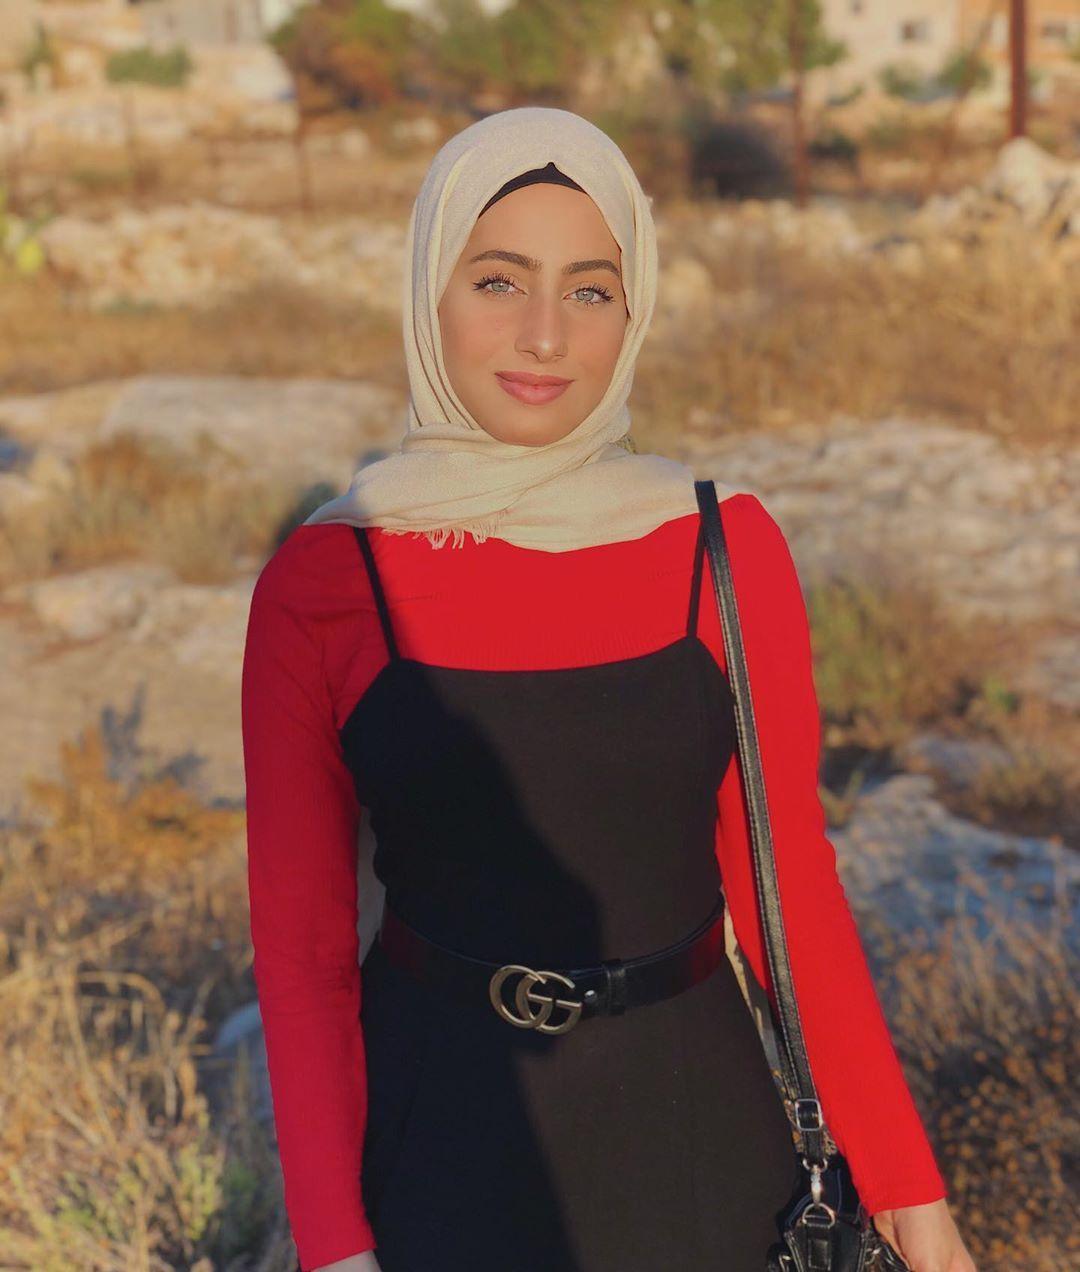 45 1k Likes 800 Comments رغد Raghad Rragoode On Instagram لا يوجد مصعد كهربائي للنجاح عليك أن تصعد السلالم Fashion Hijabi Nun Dress